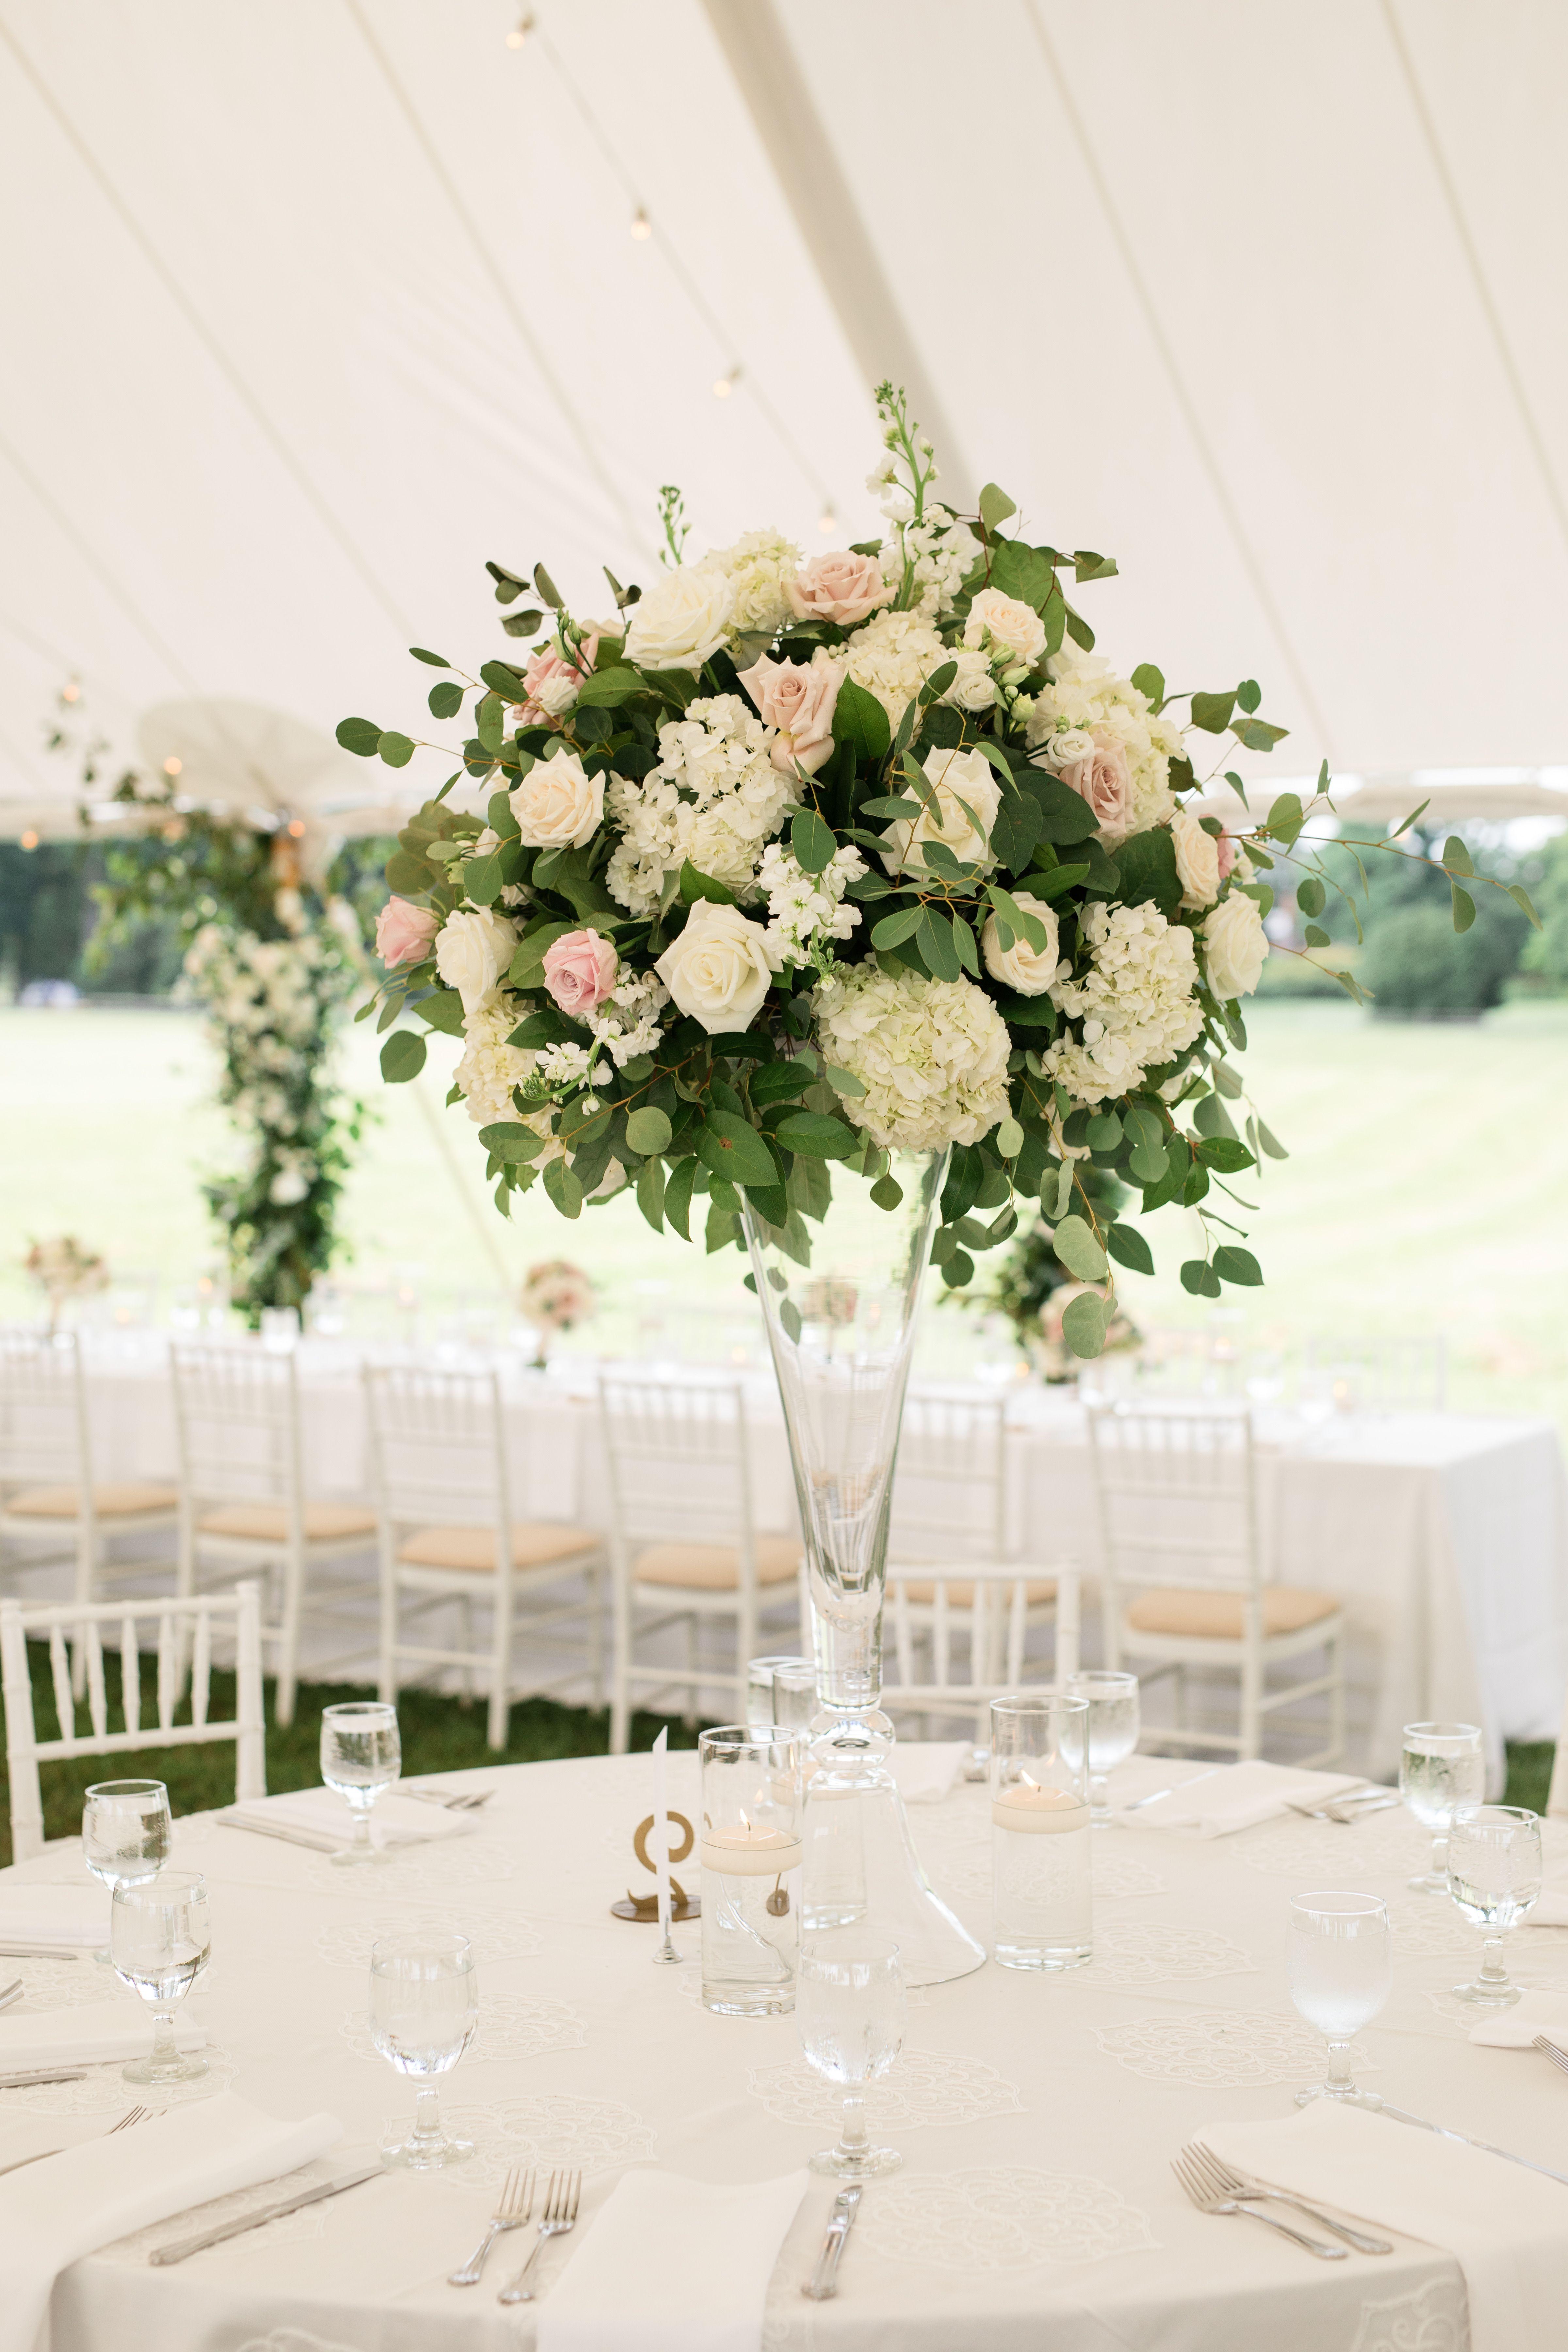 Wedding Flowers Inspiration Ideas In 2020 Wedding Flowers Wedding Flower Inspiration Wedding